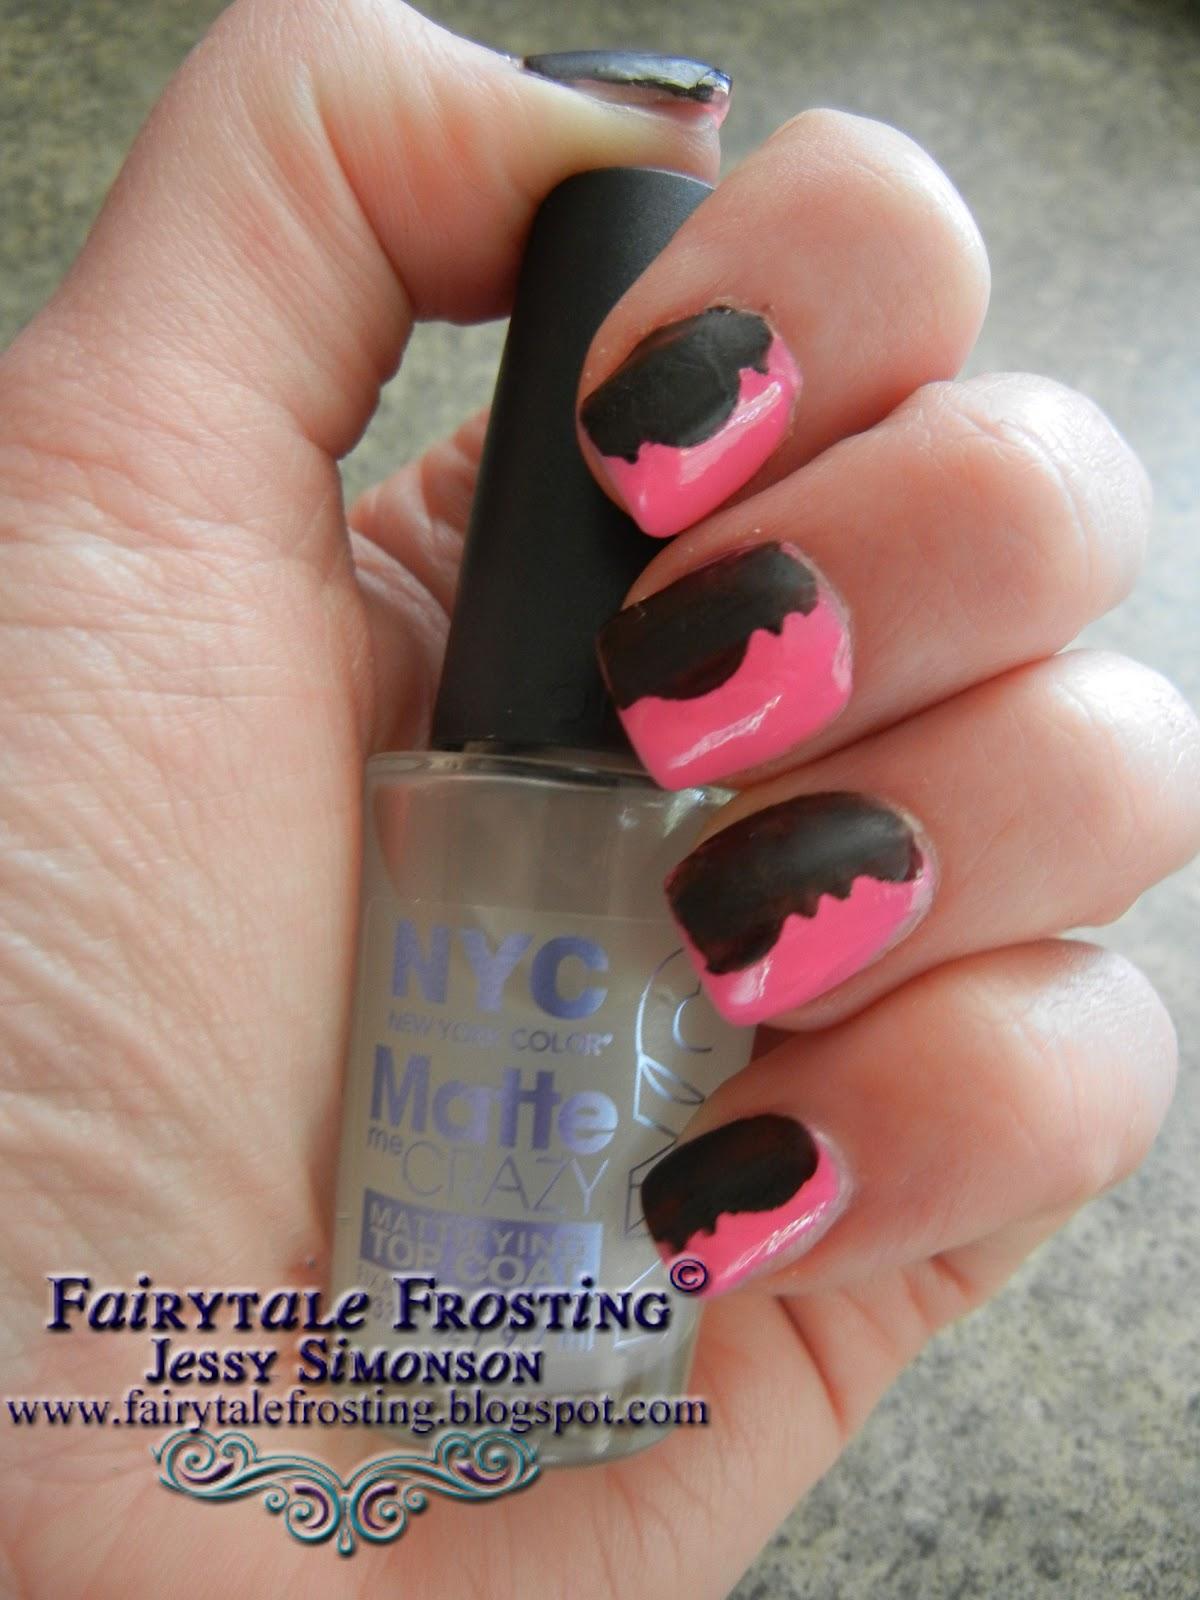 Fairytale Frosting: Decorative Scissors Nail Art